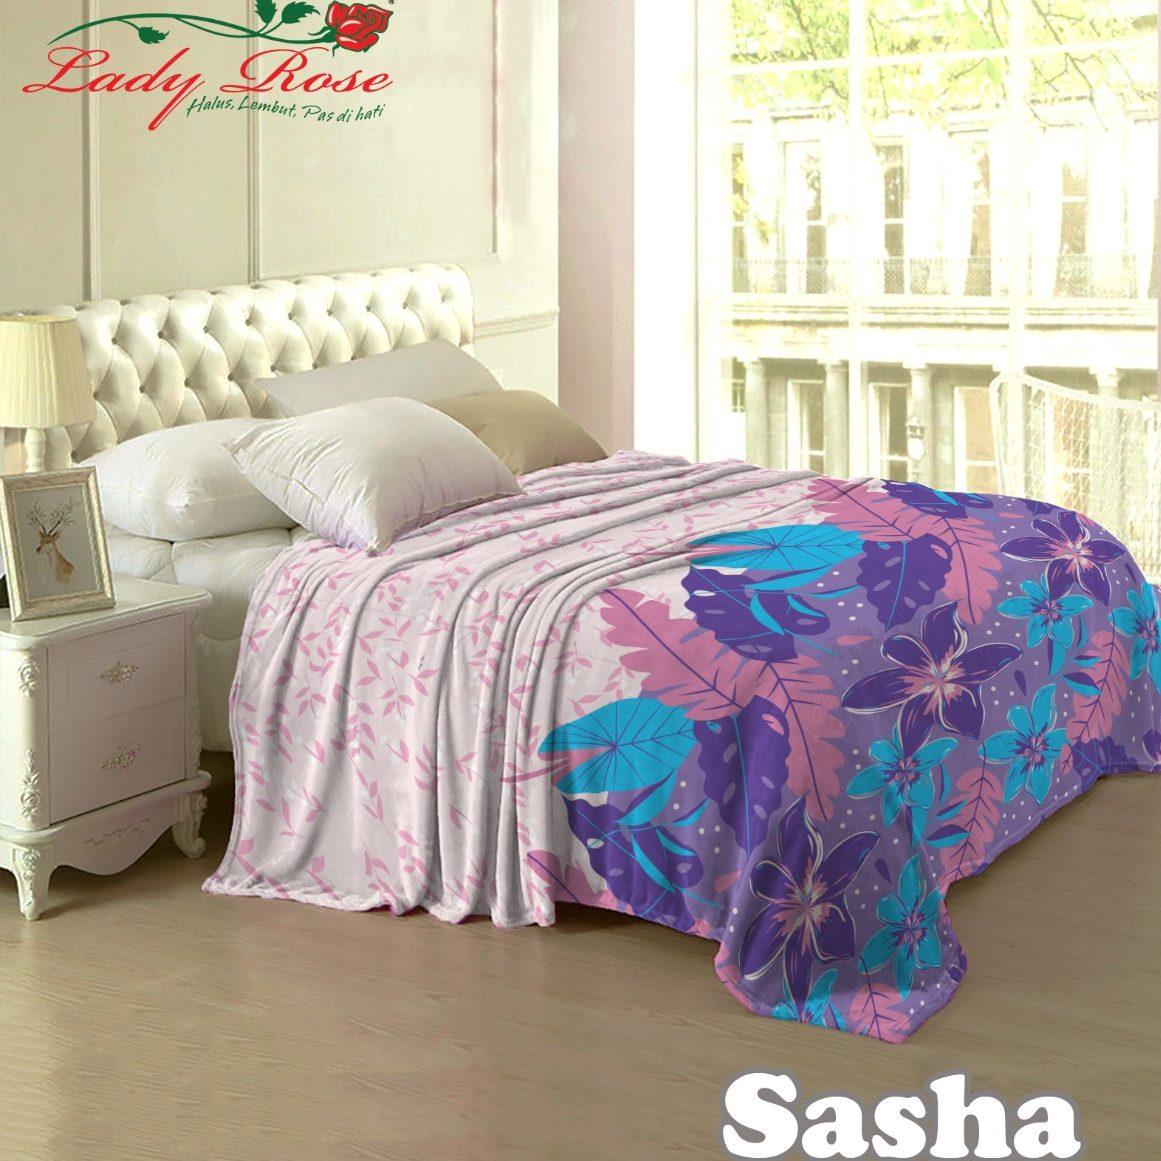 Selimut Lady Rose Terlaris bulu halus uk 160x200 motif Sasha